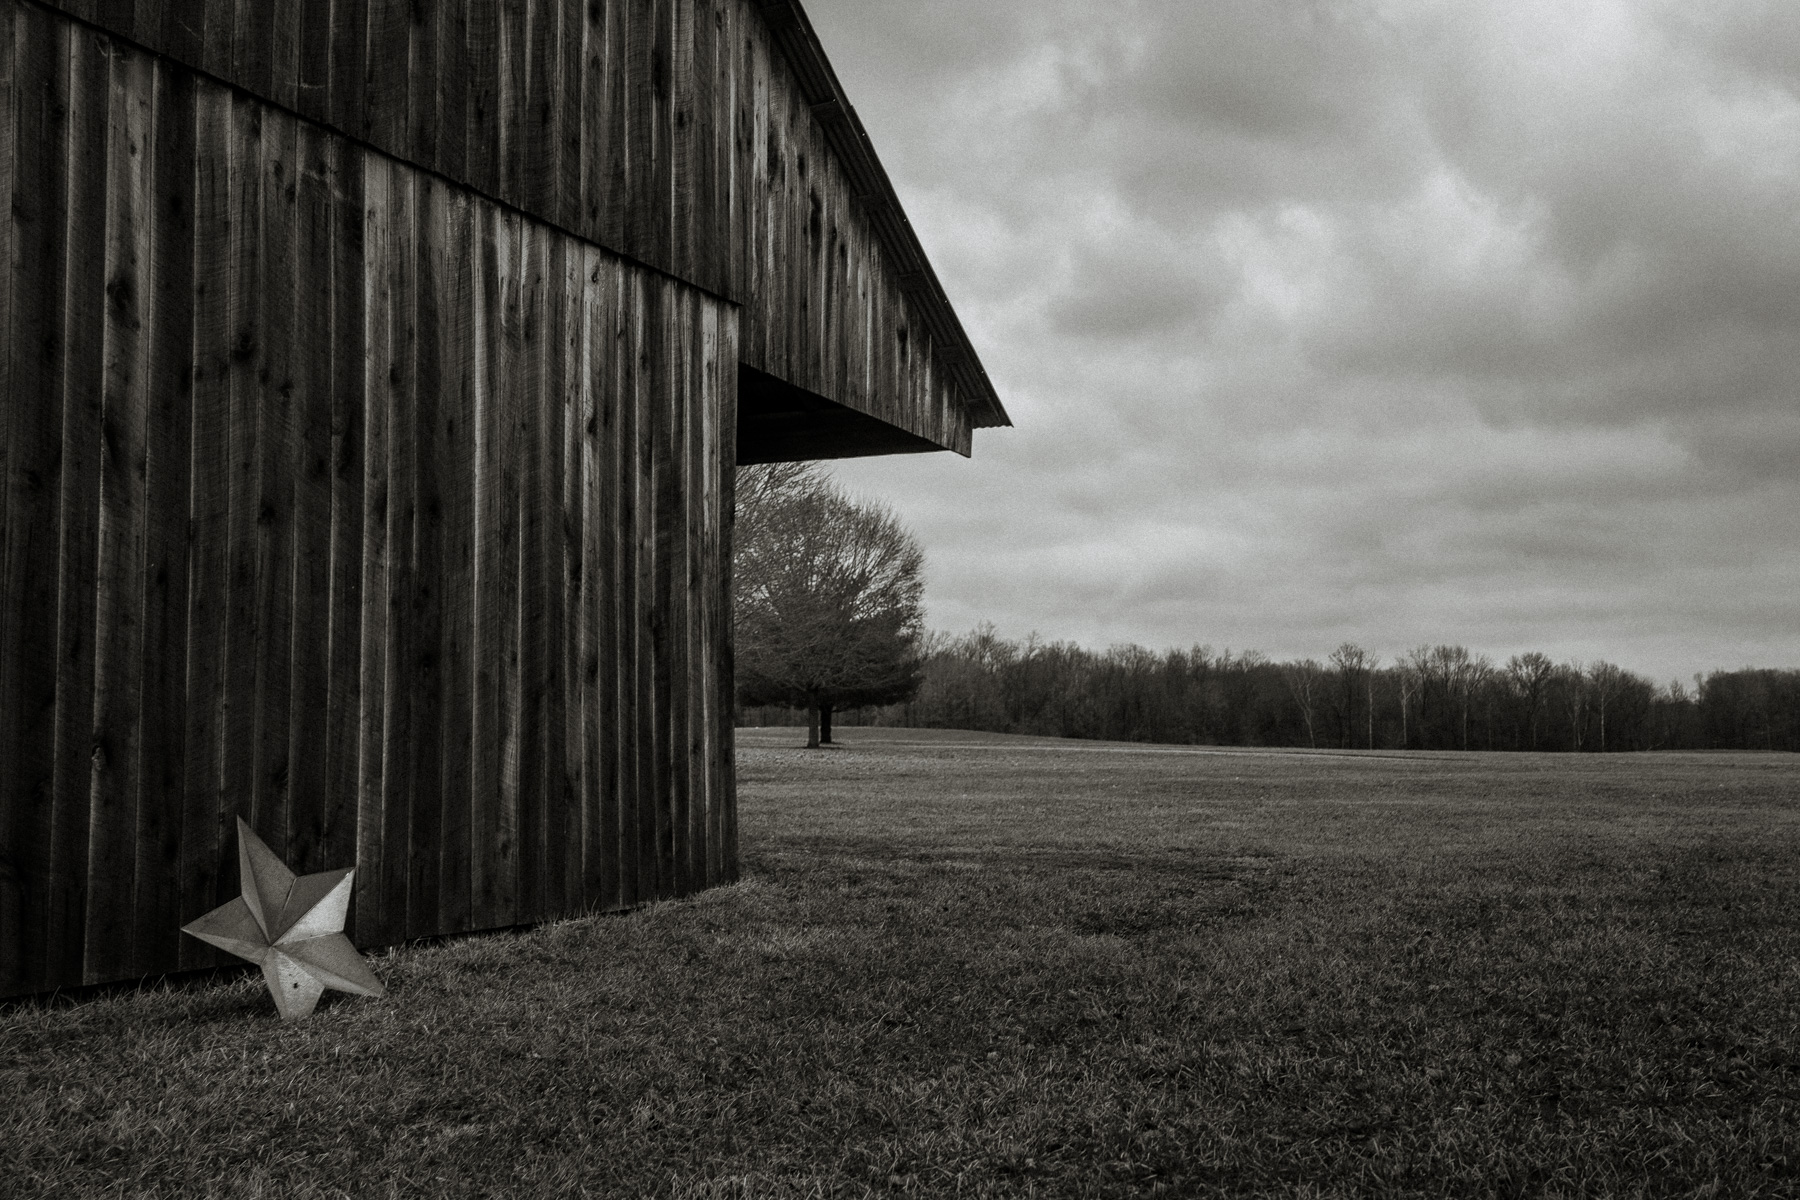 Fallen Barn Star